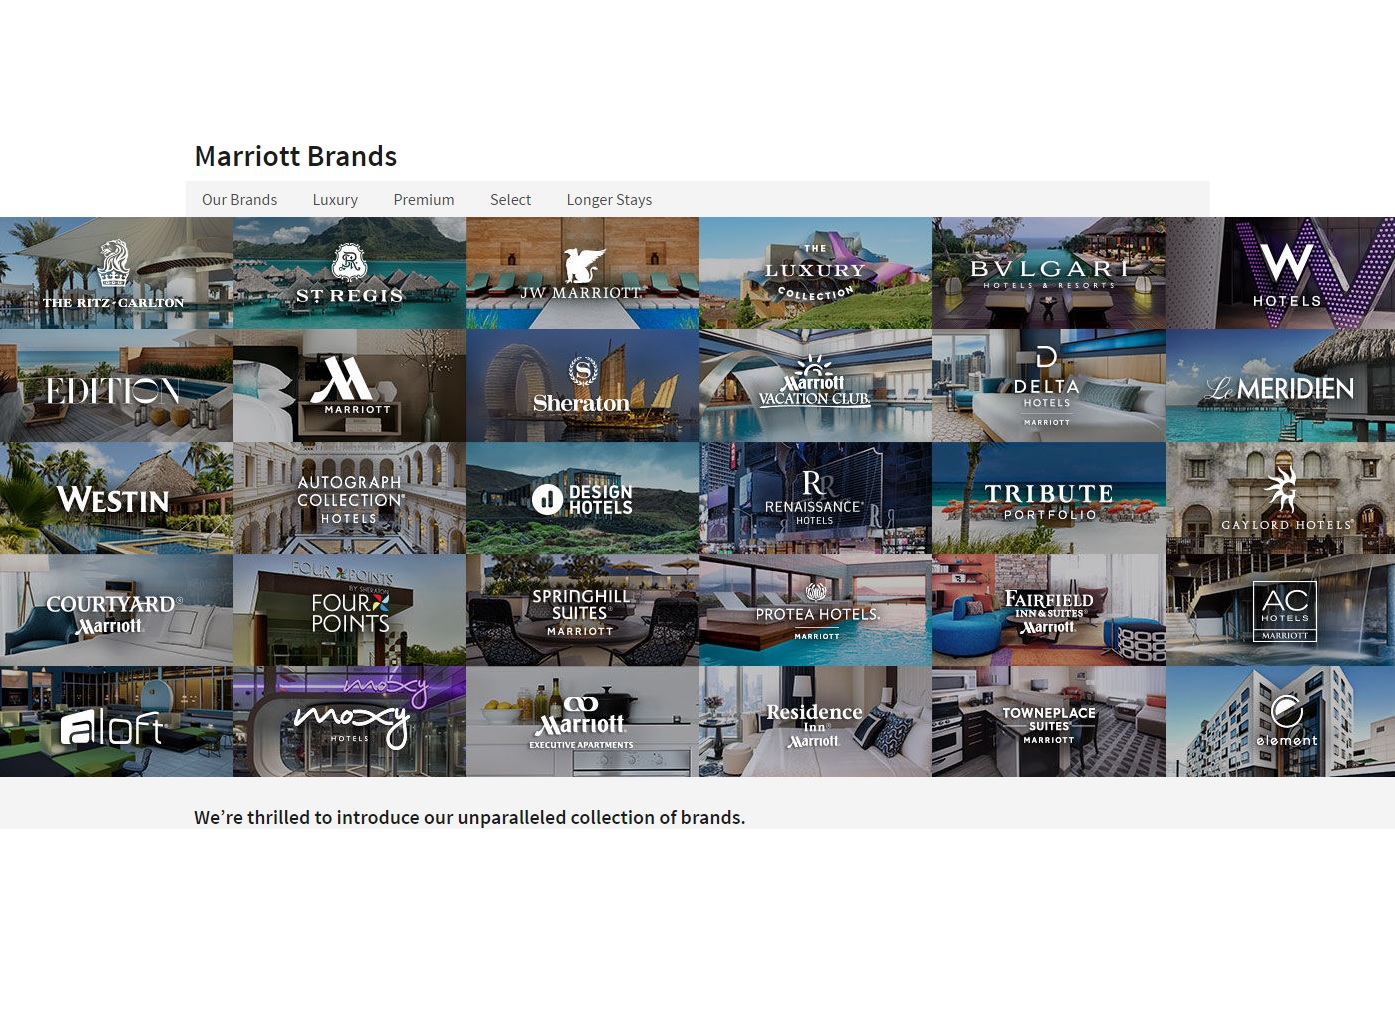 Marriott International has launched segmentation of its 31